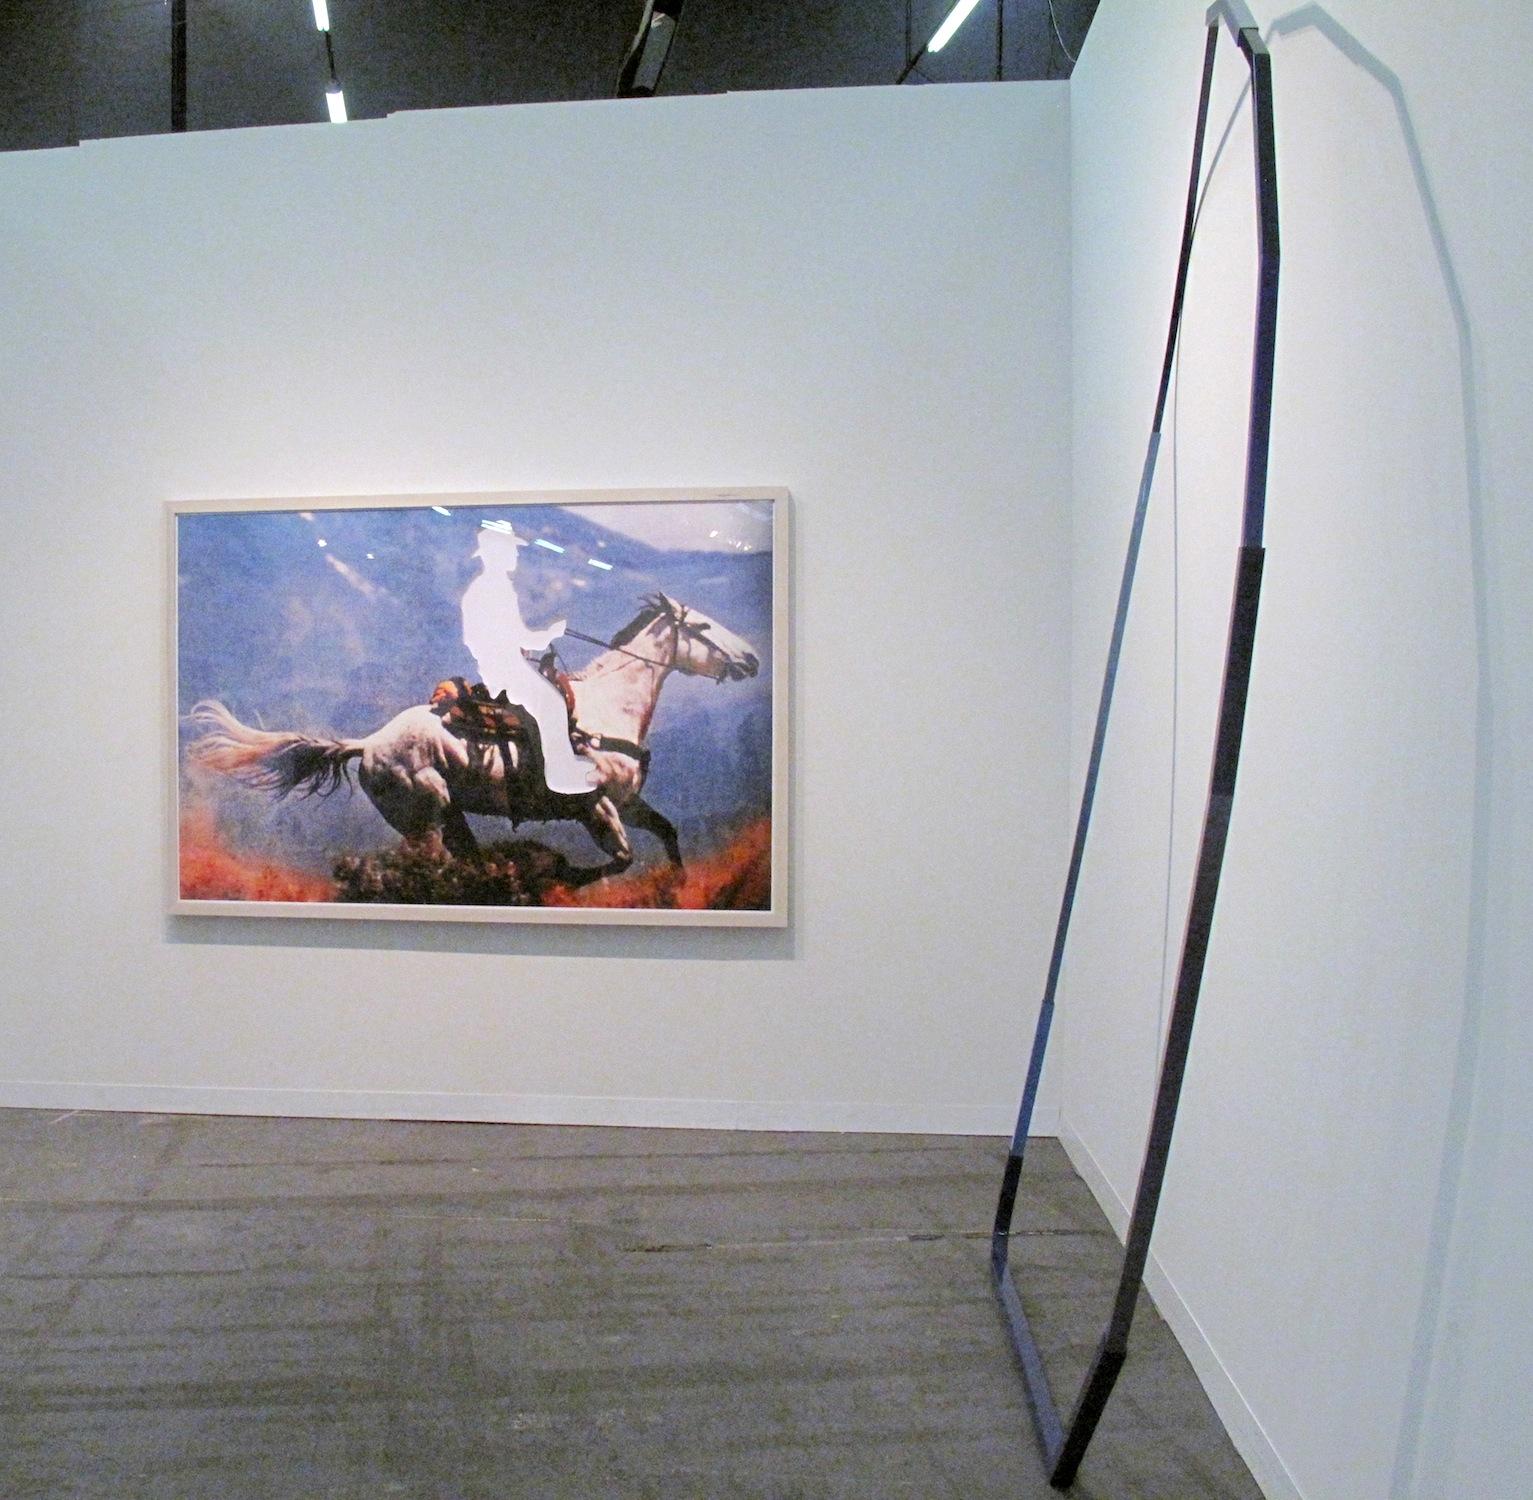 Figge von Rosen Galerie, Cologne/Berlin, Armory Presents Jose Dàvila and Ignacio Uriarte, Installation view, The Armory Show, New York, 2014, Pier 94